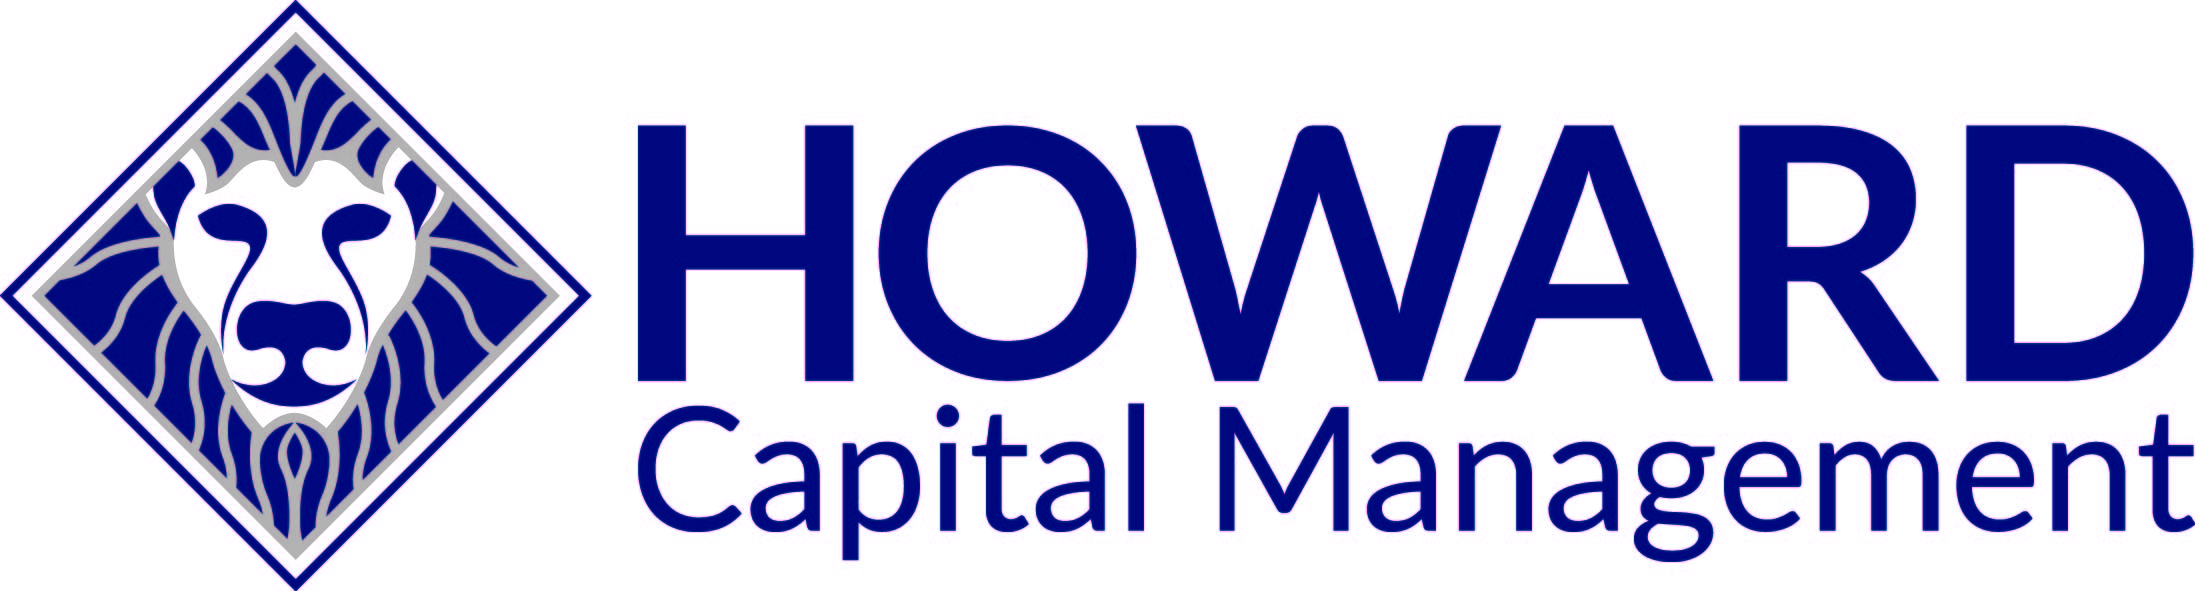 Howard Capital Management logo